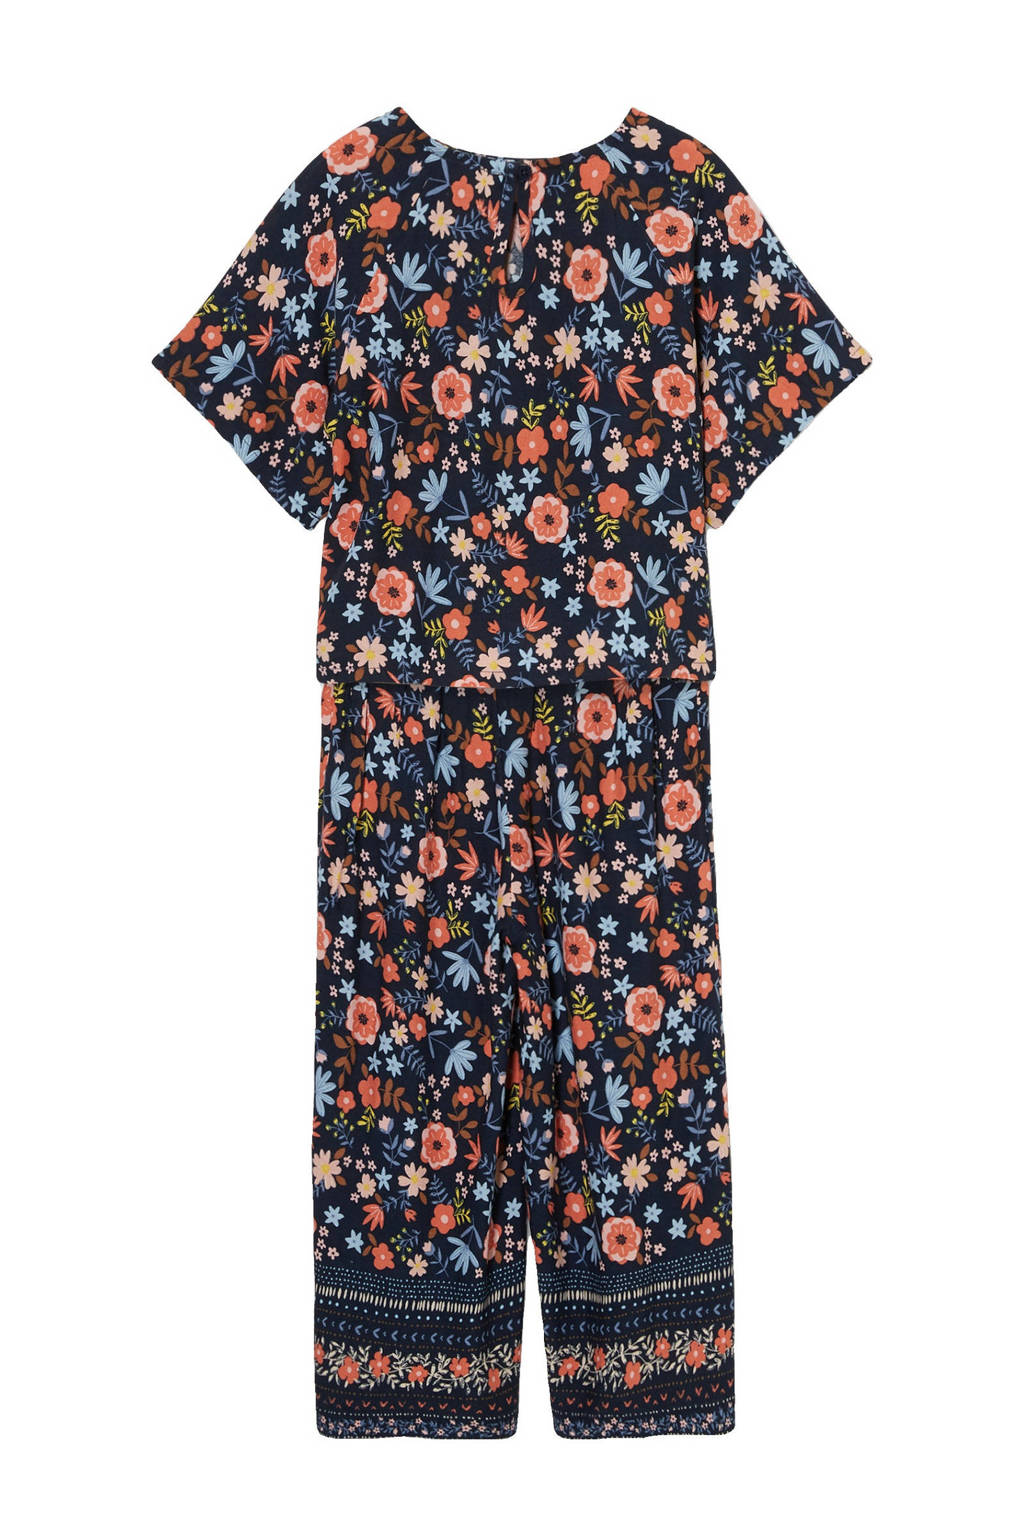 C&A Happy girls Club T-shirt + broek bloemen multi, Donkerblauw